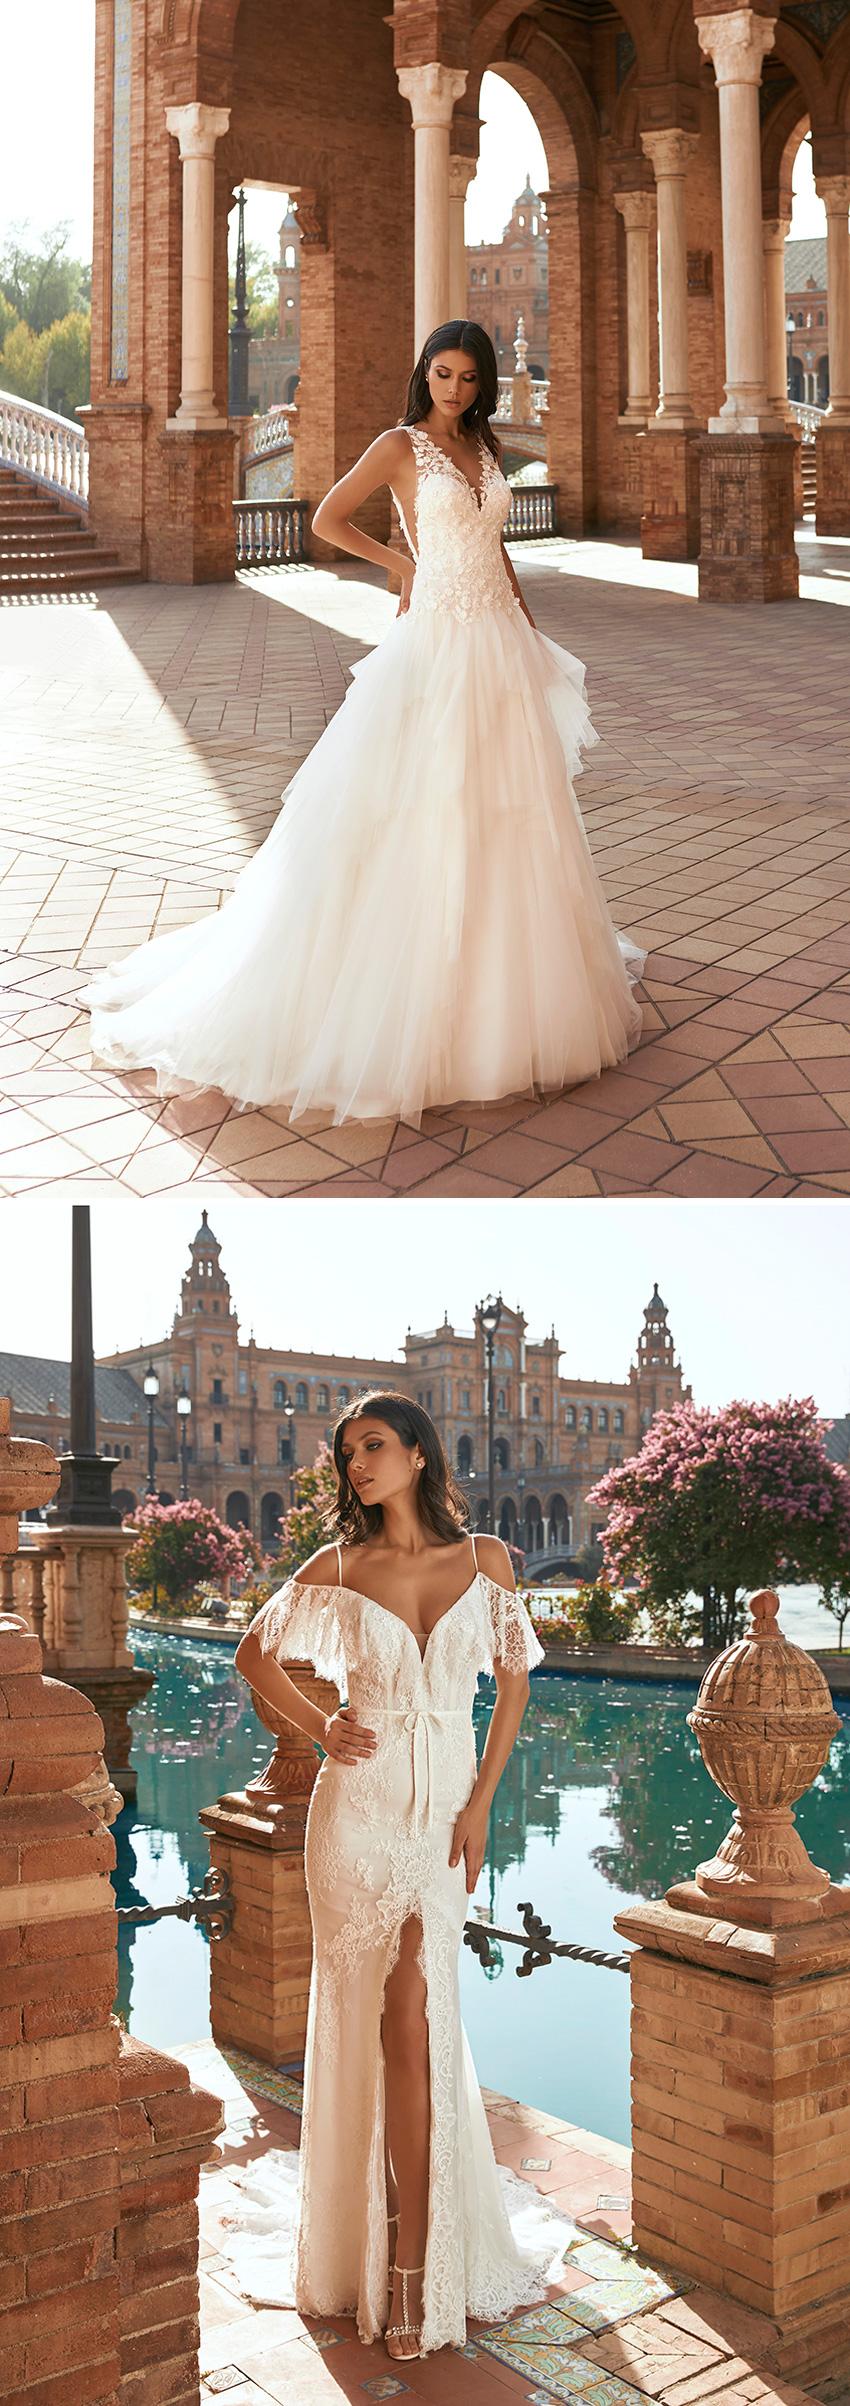 Marchesa for Pronovias new bridal collection in Perfect Wedding Magazine